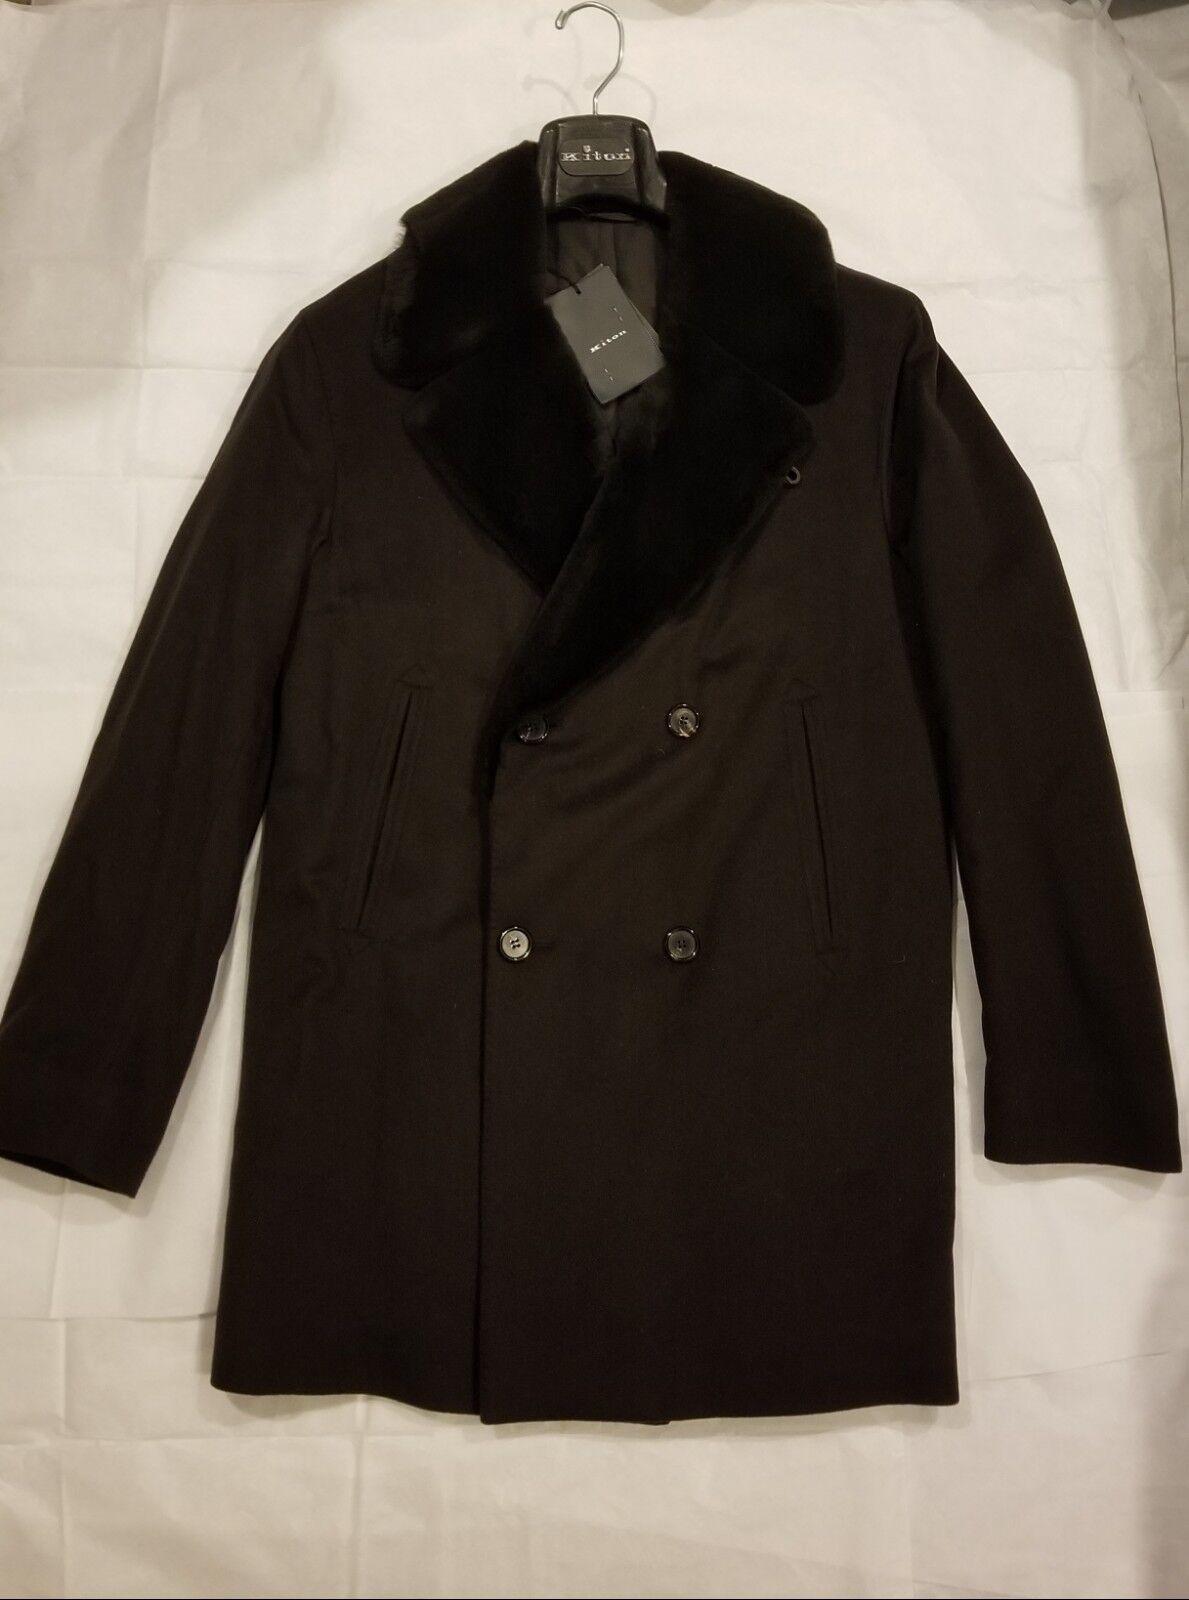 Brand New Kiton 100% Guanaco Coat with Beaver Fur Collar Größe 40 US